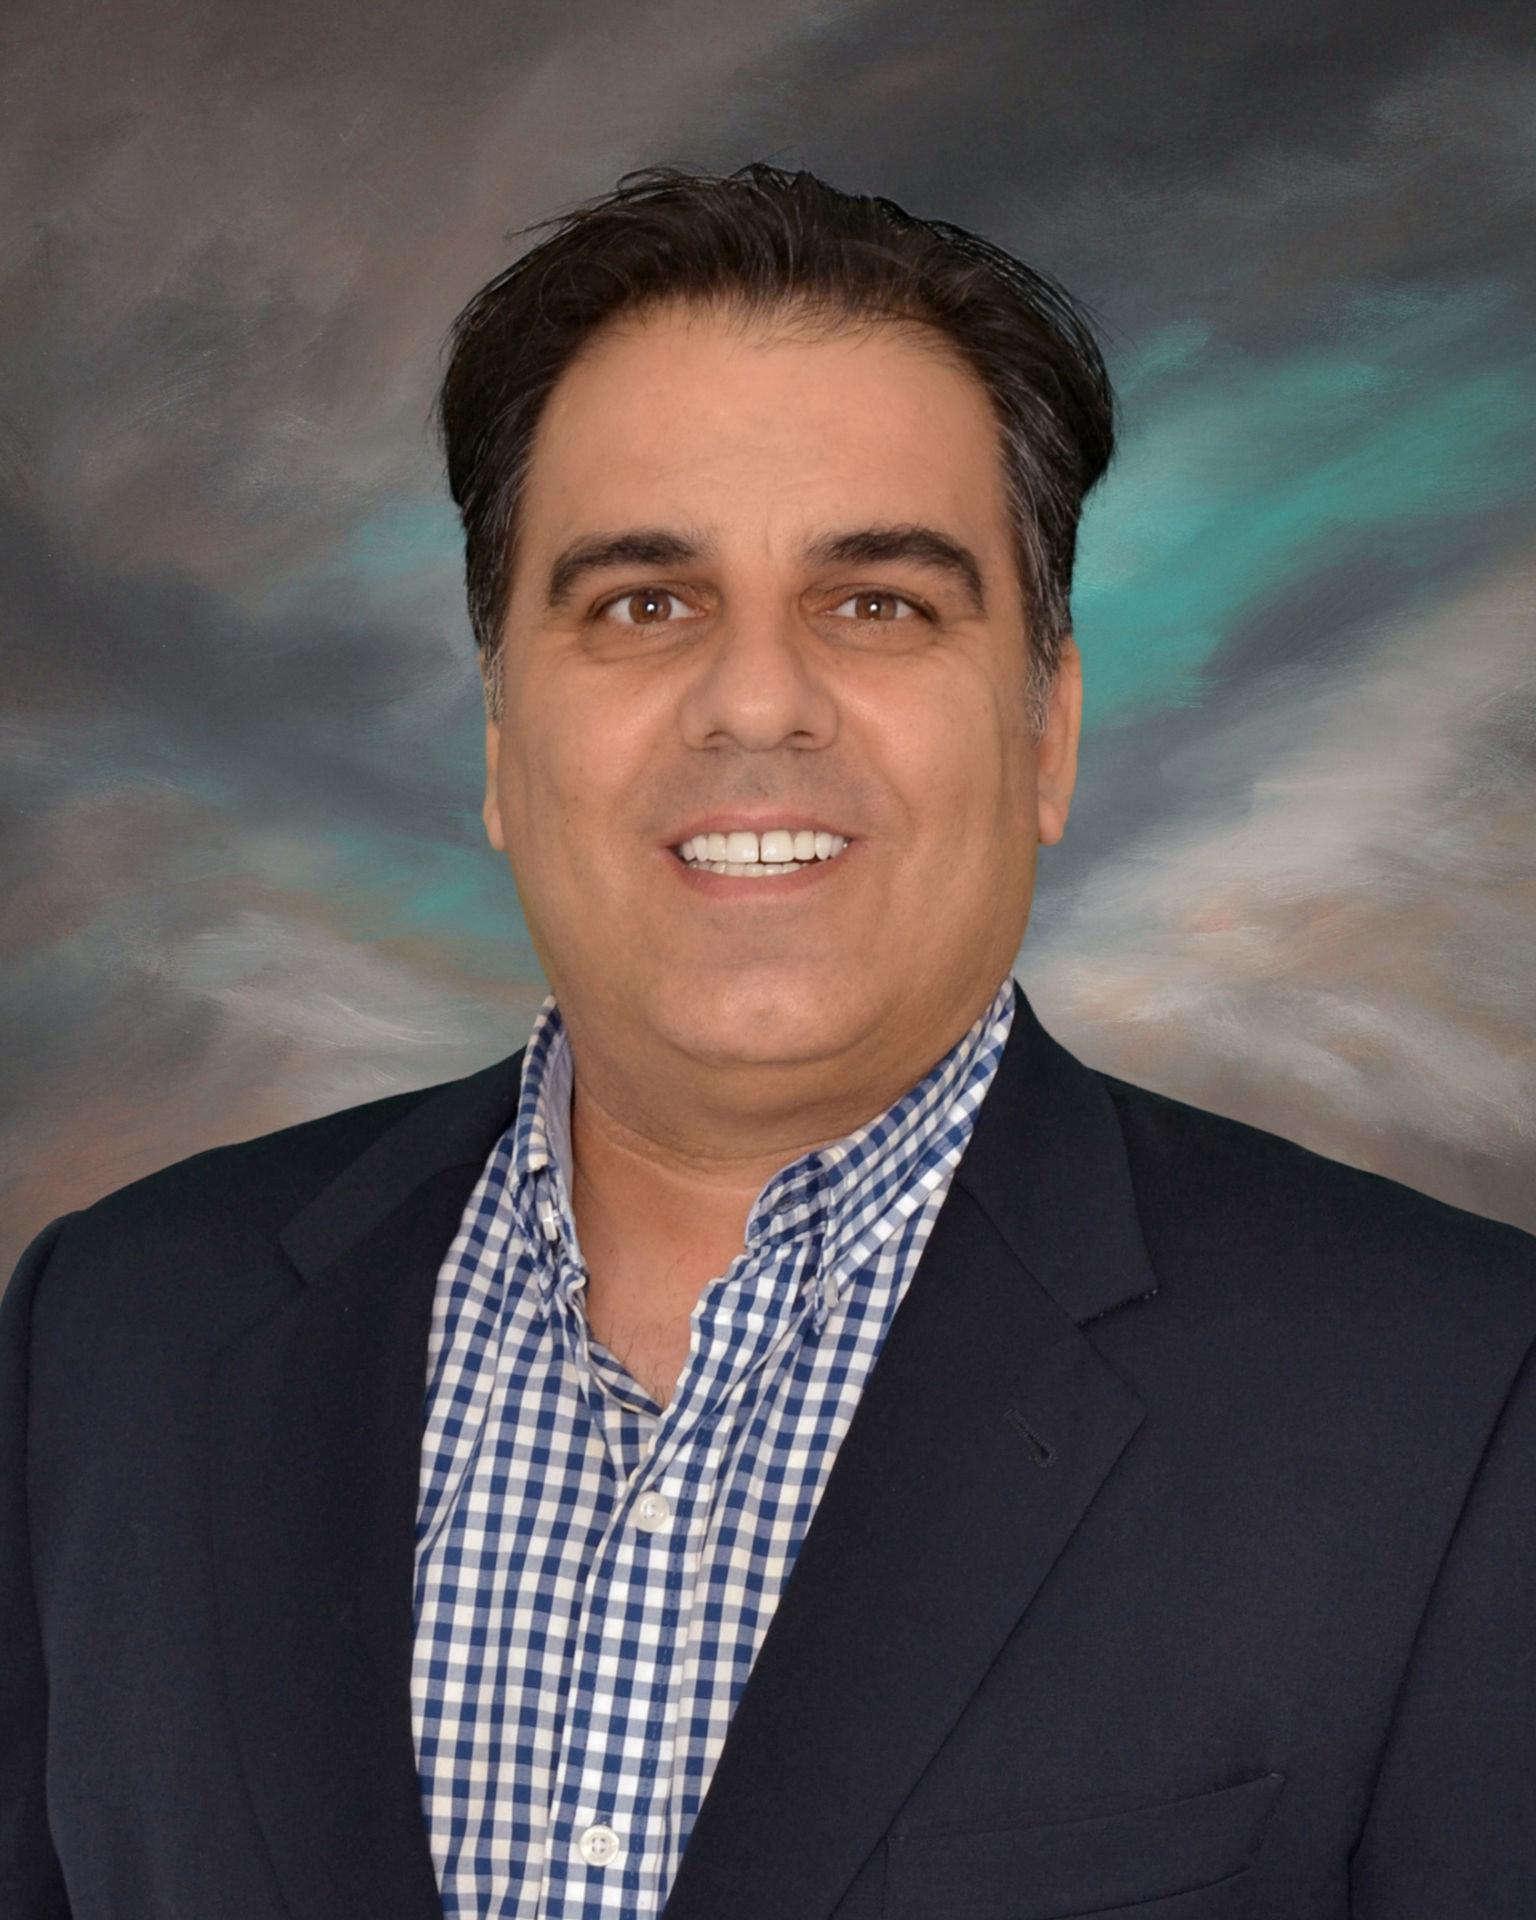 David Zlaket, Child Nutrition Director